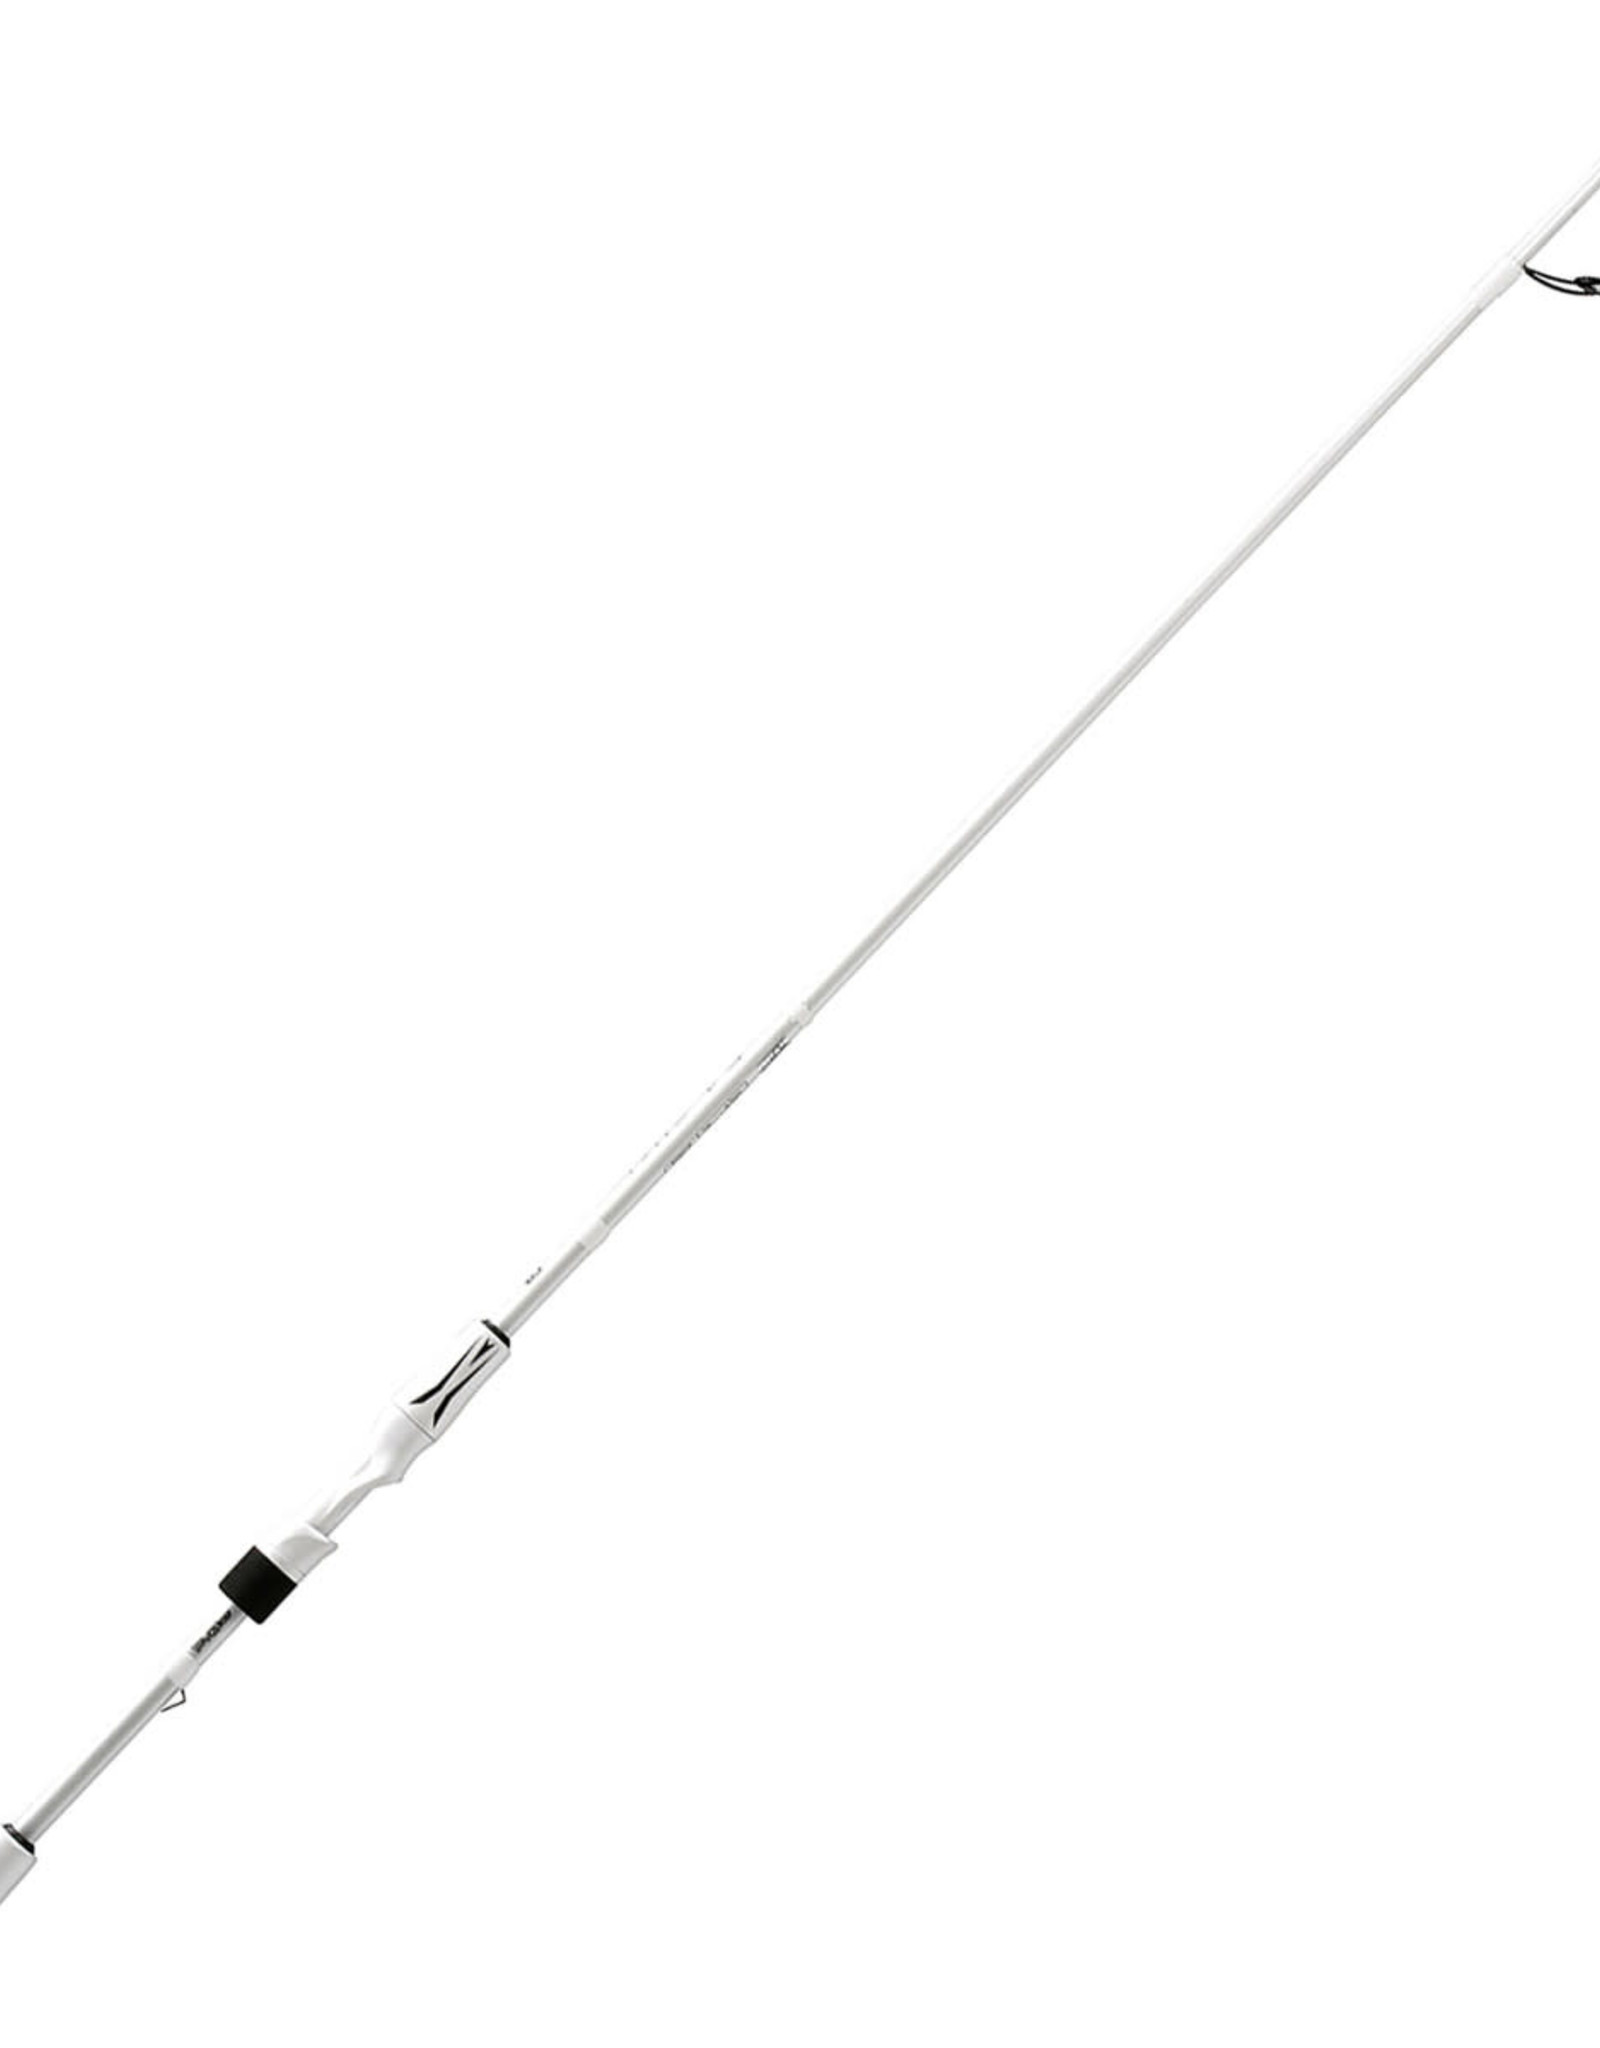 "DQC International Corp. 13 Fishing Fate V3 - 7'1"""" M Spinning Rod - 1PC"